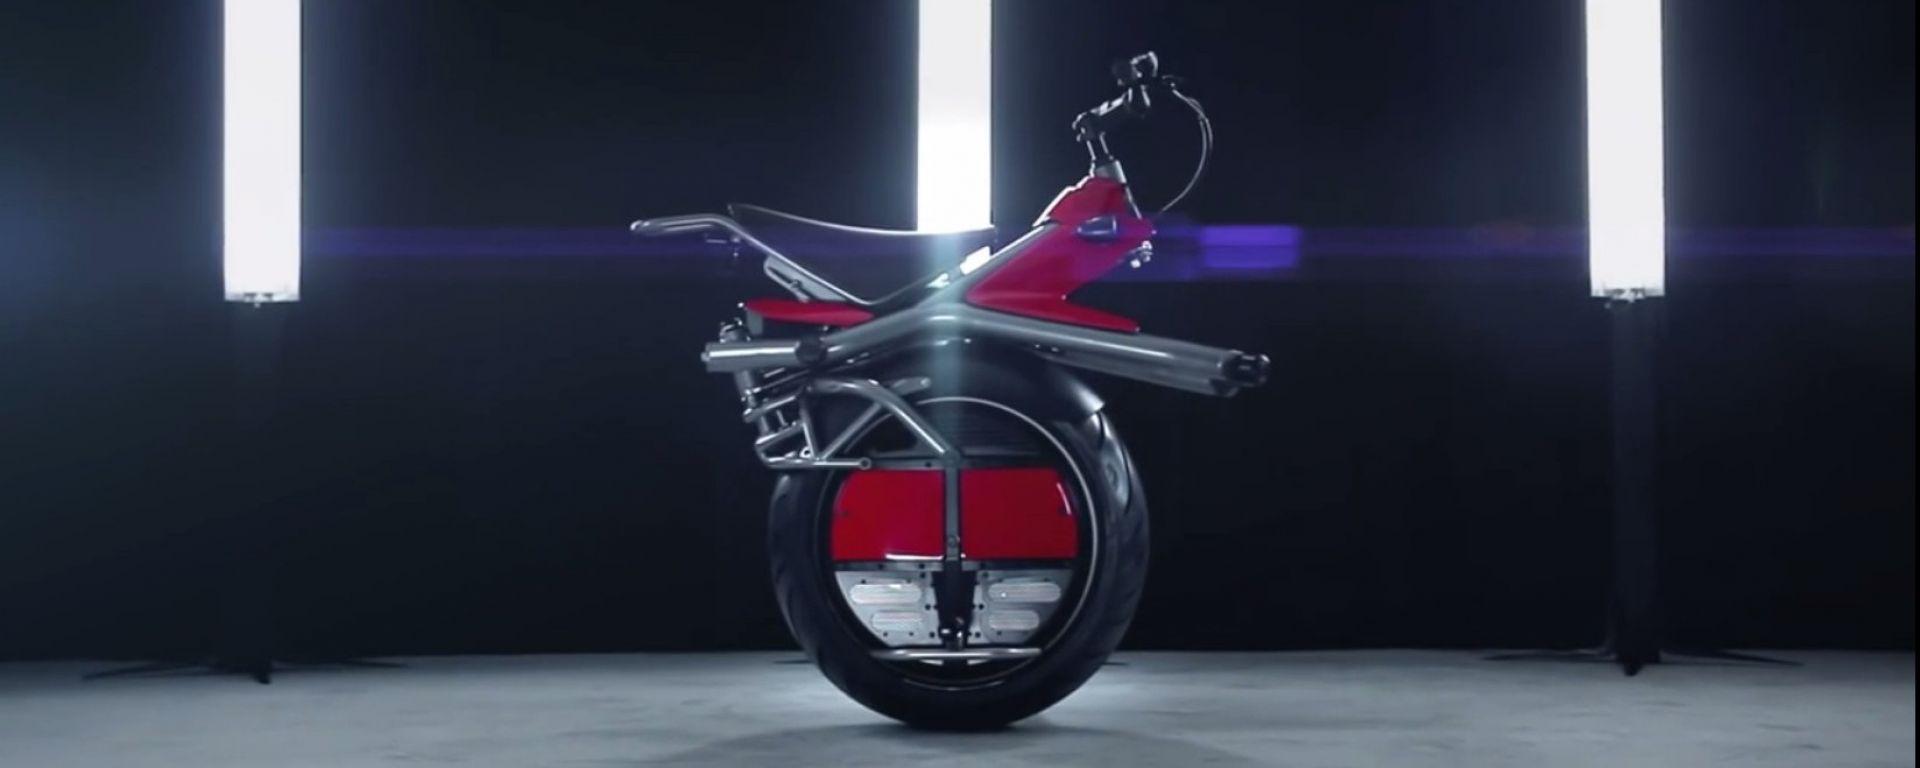 Ryno scooter elettrico